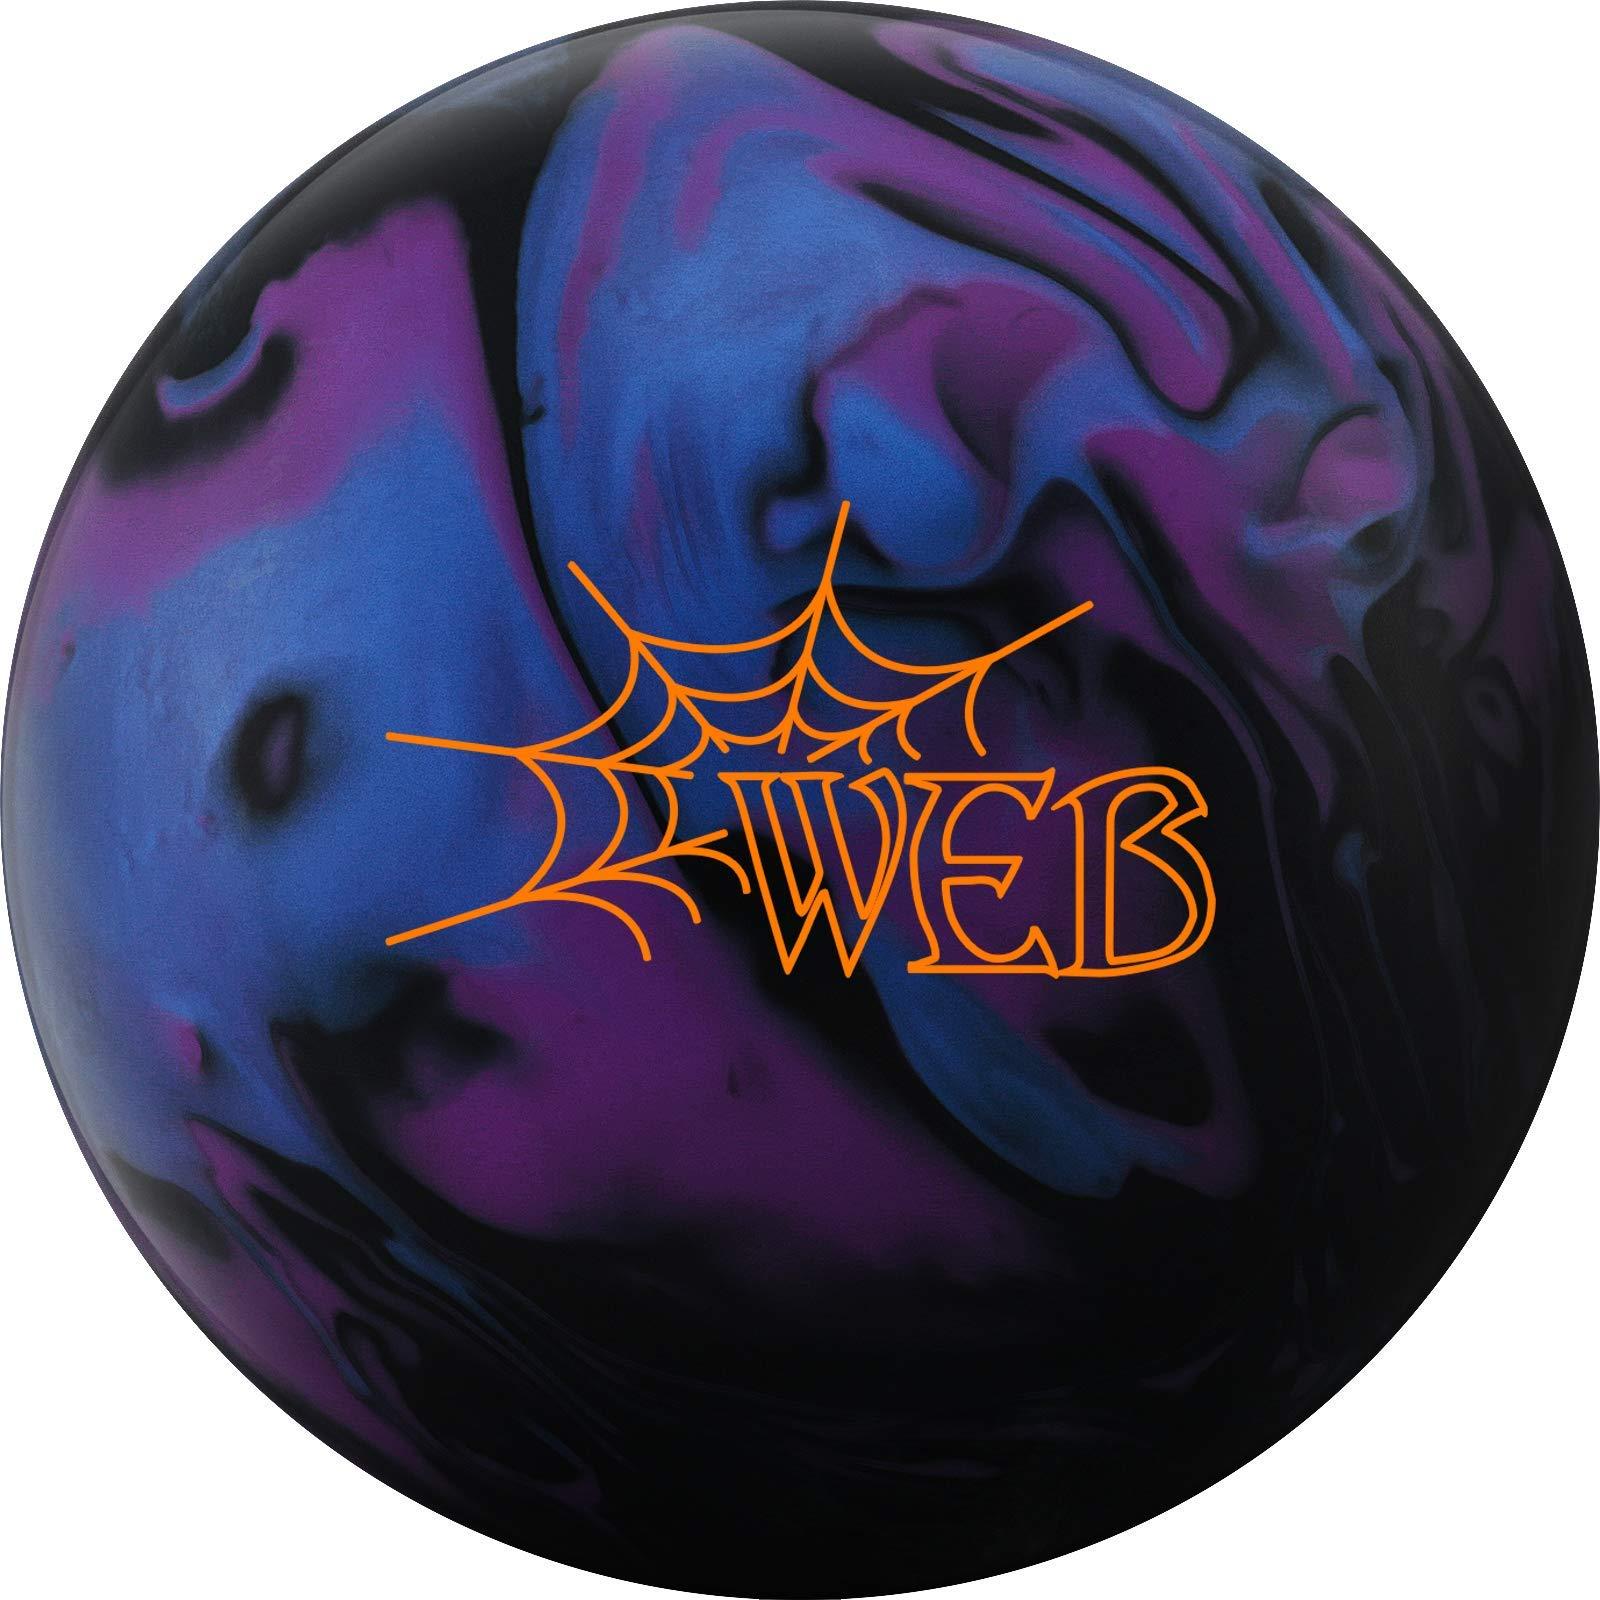 Hammer 029744028057 Web Bowling Ball, Blue/Purple/Black, 12